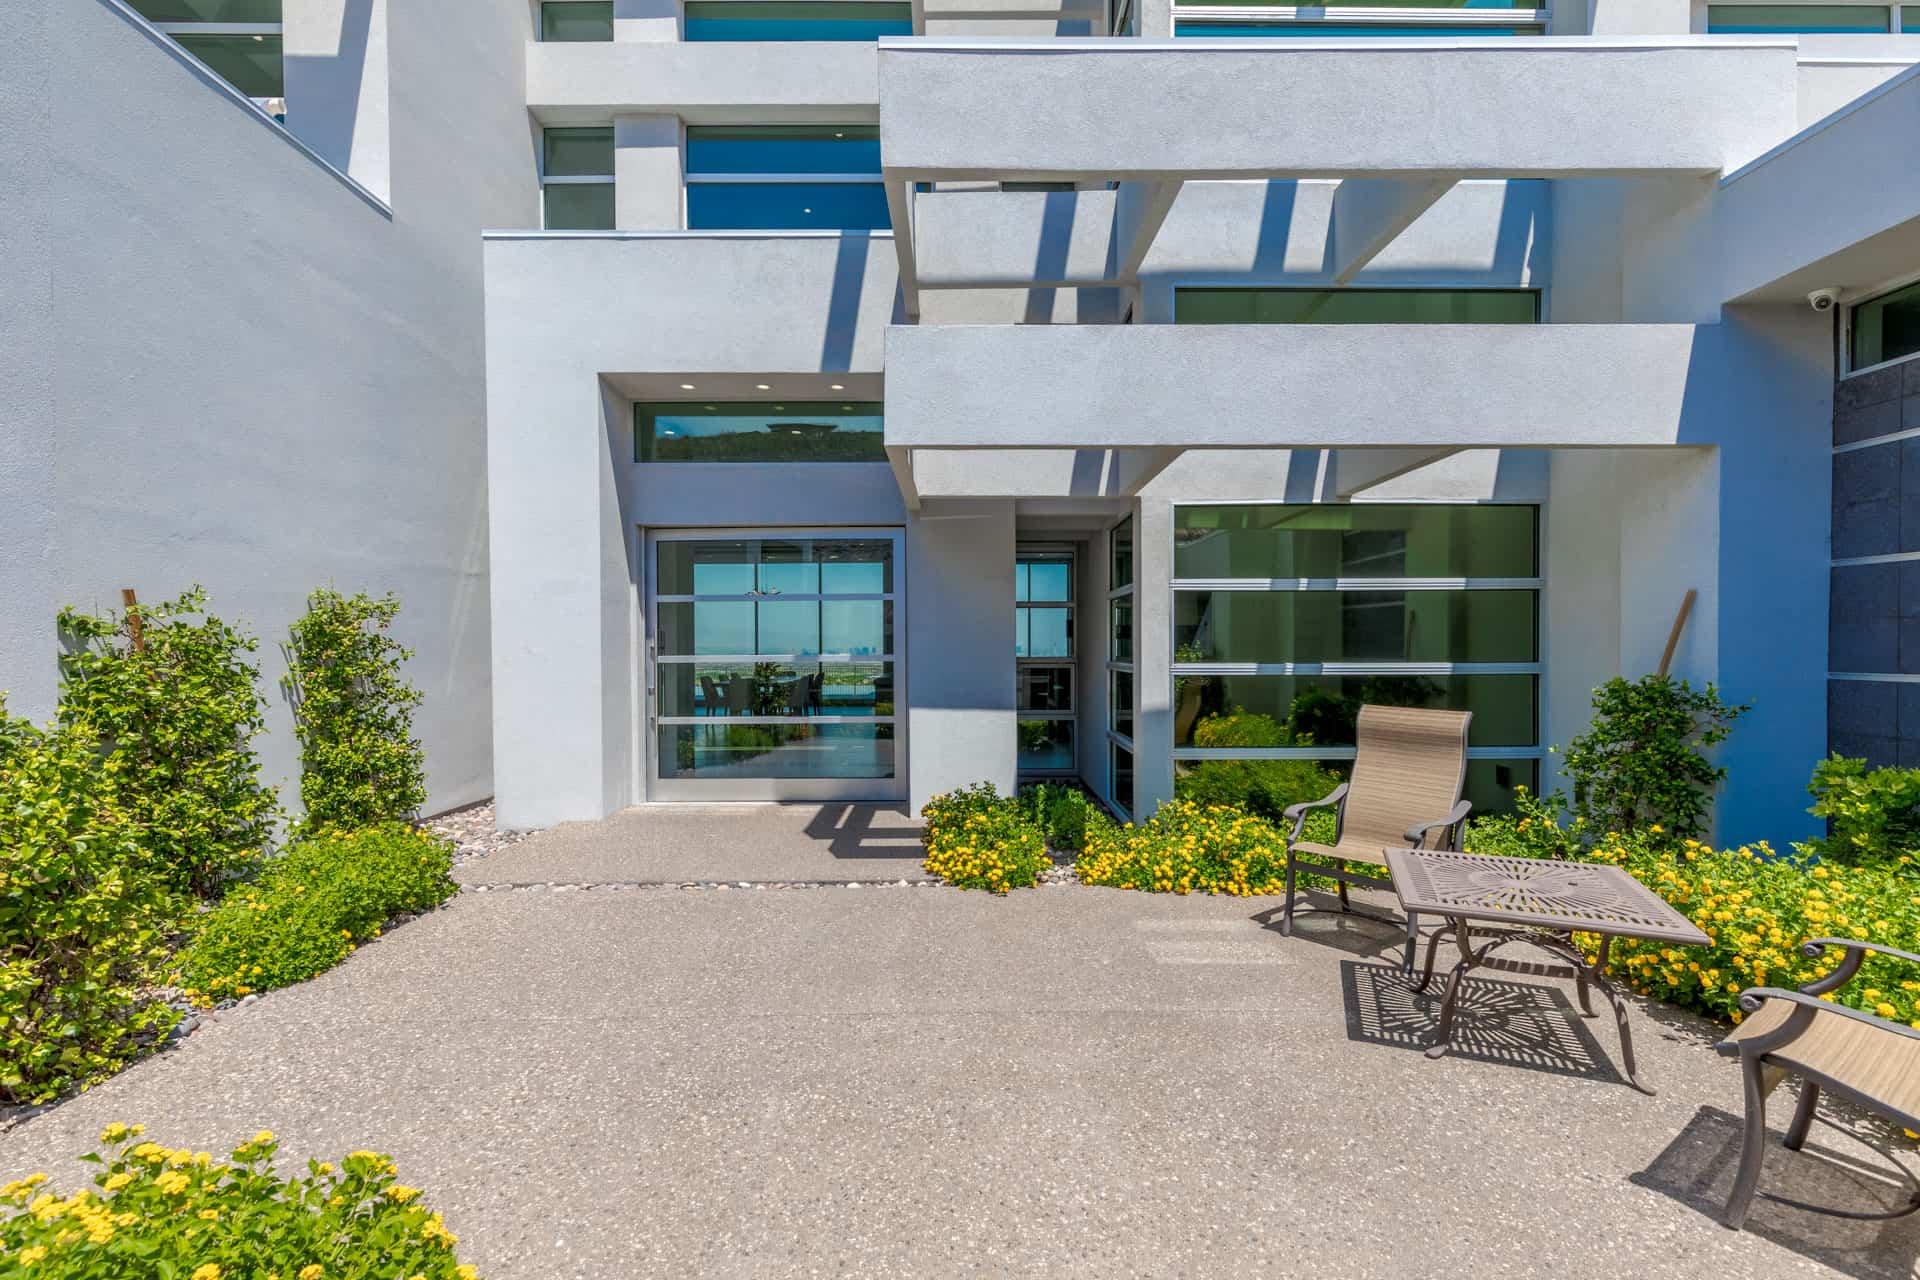 las-vegas-luxry-real-estate-realtor-rob-jensen-company-5-rockstream-drive-ascaya015